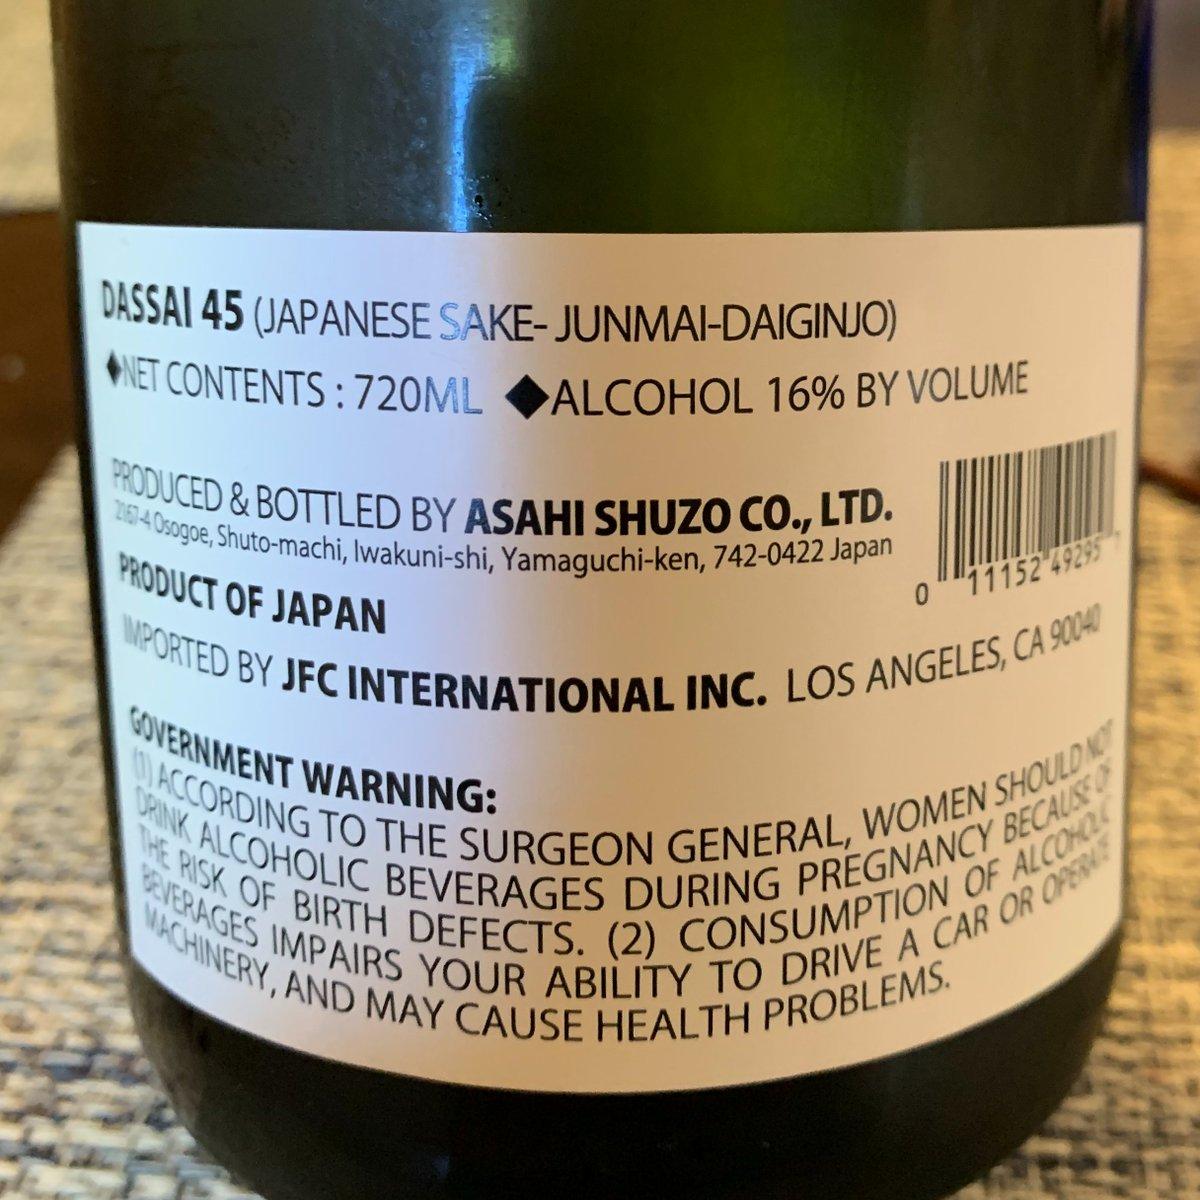 test ツイッターメディア - 獺祭 純米大吟醸45 山口の旭酒造のお酒。山田錦を使った純米大吟醸のみに集中している獺祭。これは、精米歩合45%。カリフォルニアの日系スーパーで、お手軽な値段で手に入る。菊水と並んで貴重な存在。 #日本酒 #獺祭 #純米大吟醸 https://t.co/v4WS0fvW4w